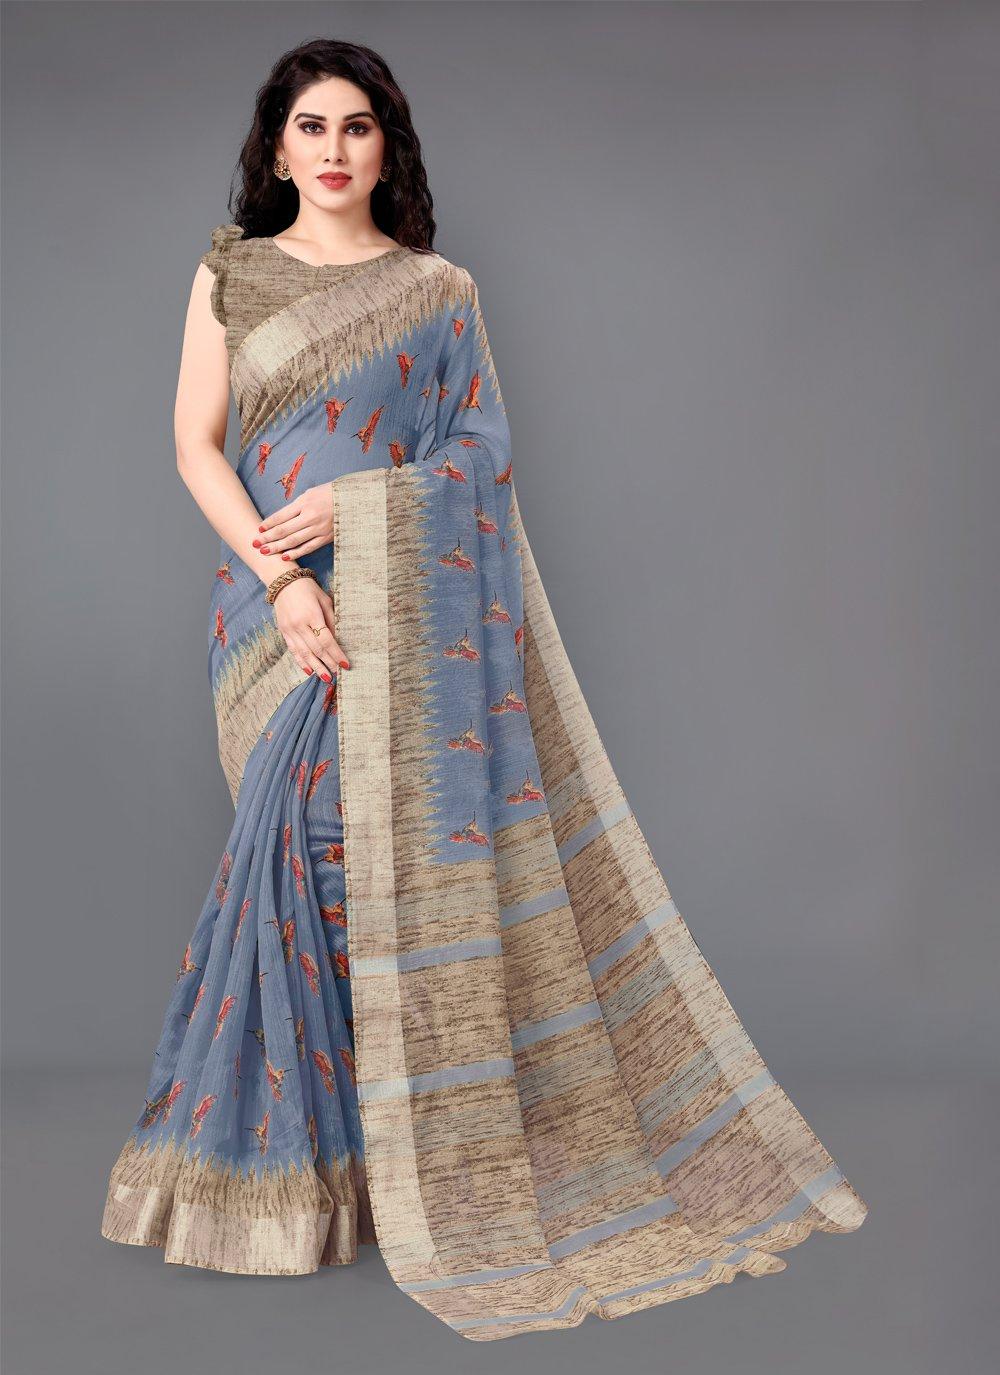 Printed Cotton Casual Saree in Grey